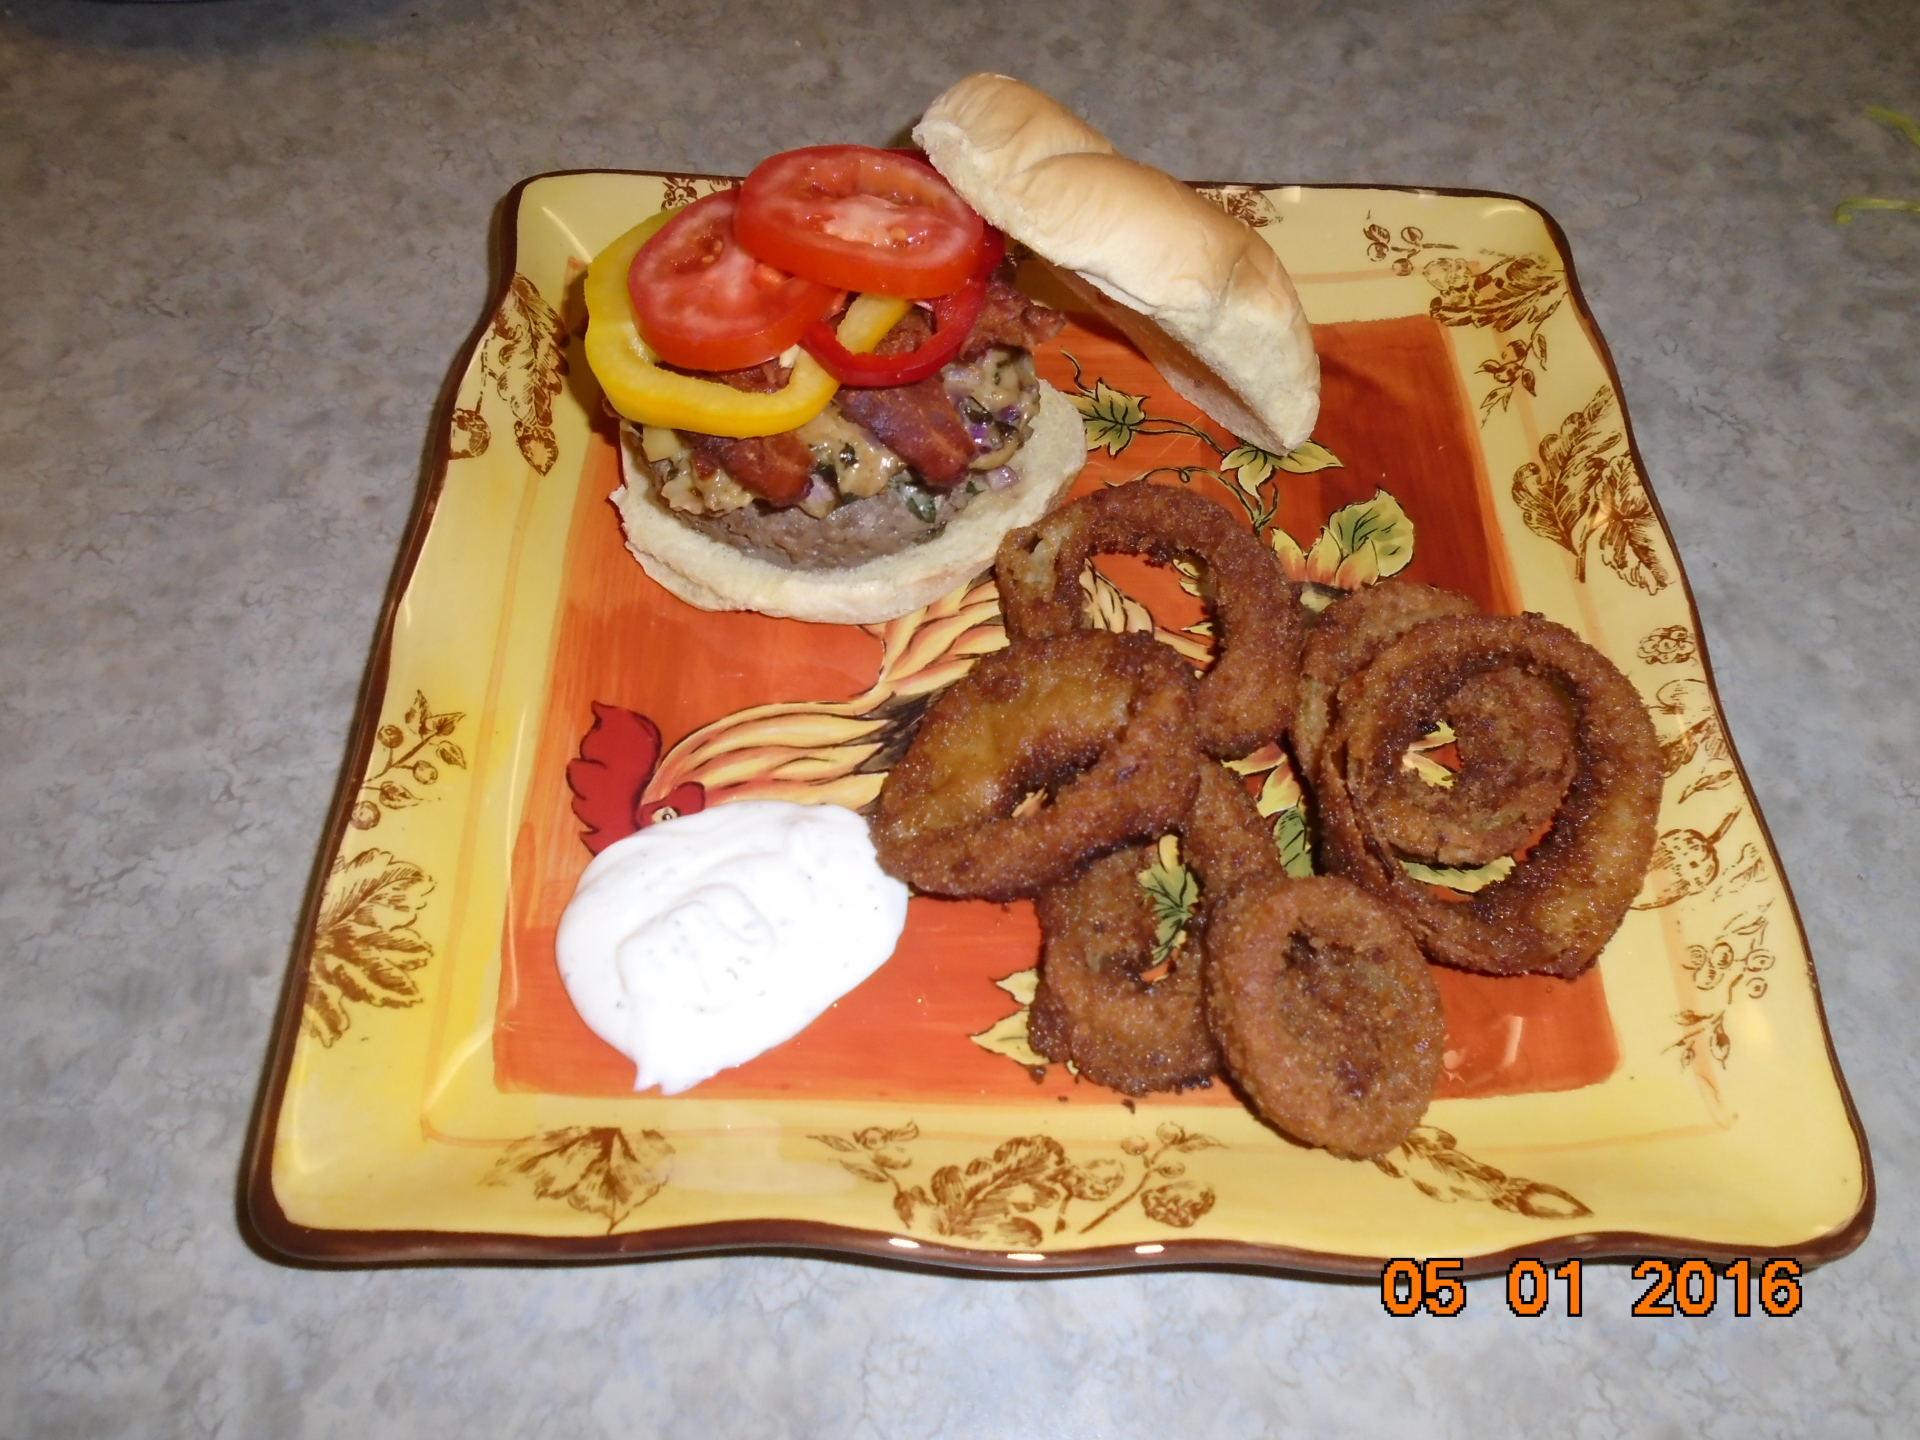 Stuffed Artichoke Burgers